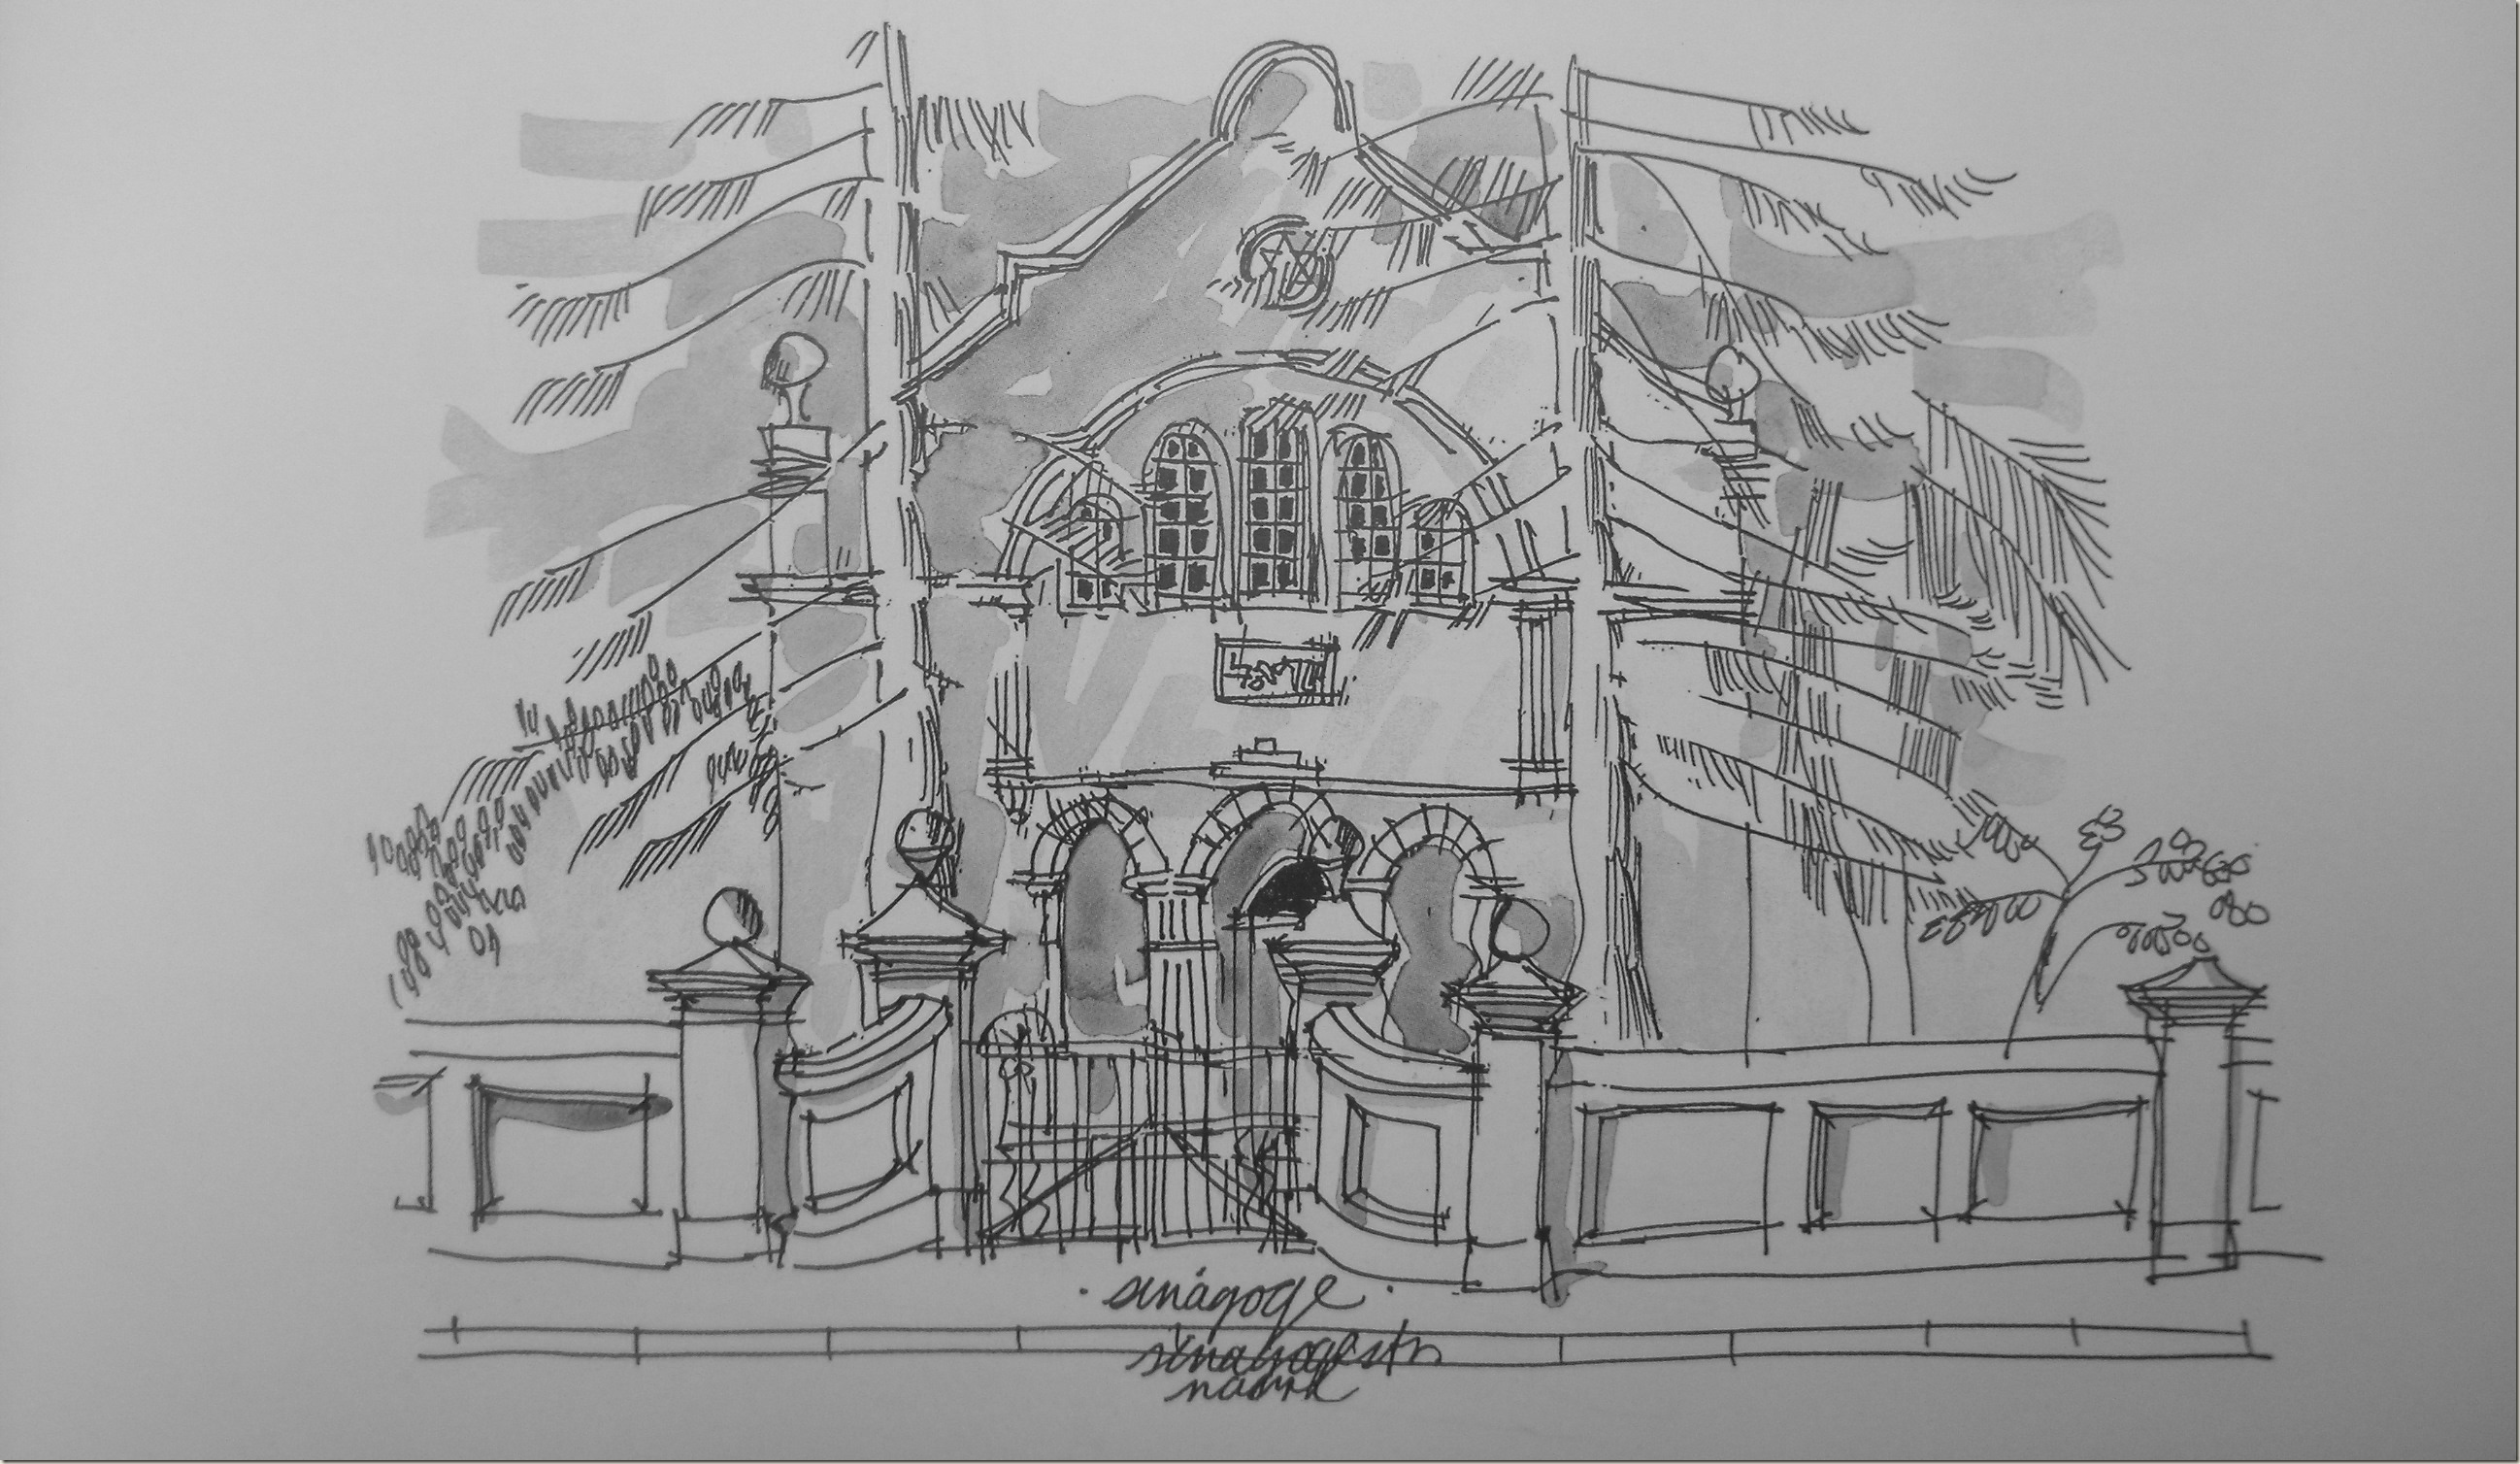 Sinagoge - Christof Albertyn